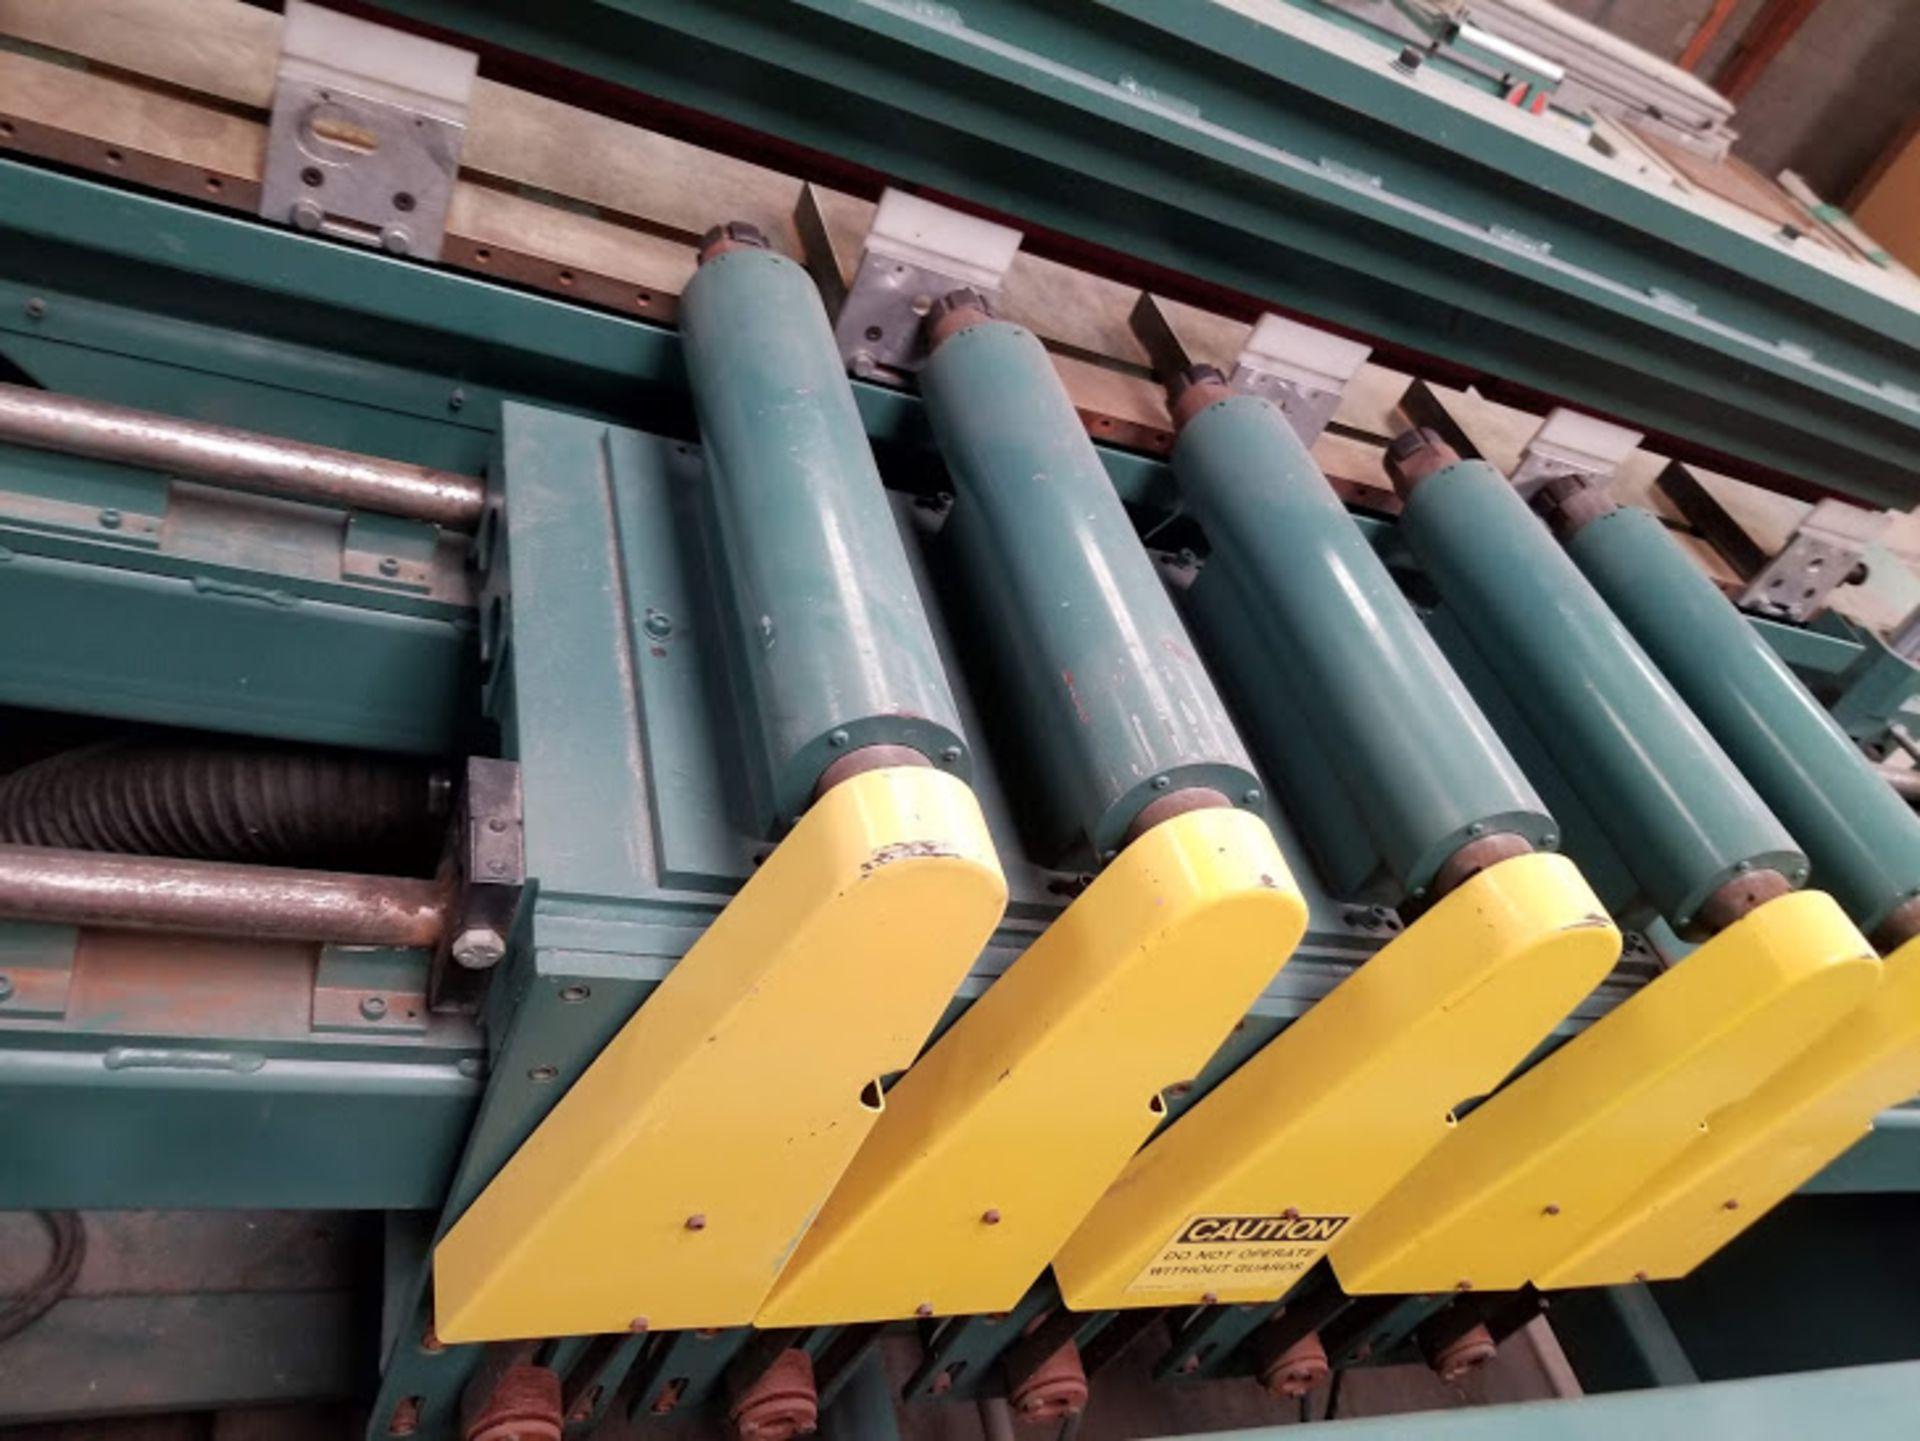 Dodds 5-Spindle Boring Machine, Model: B-802 Baldor 1.5HP 208-230/460 Volts (5 Motors) - Image 6 of 6